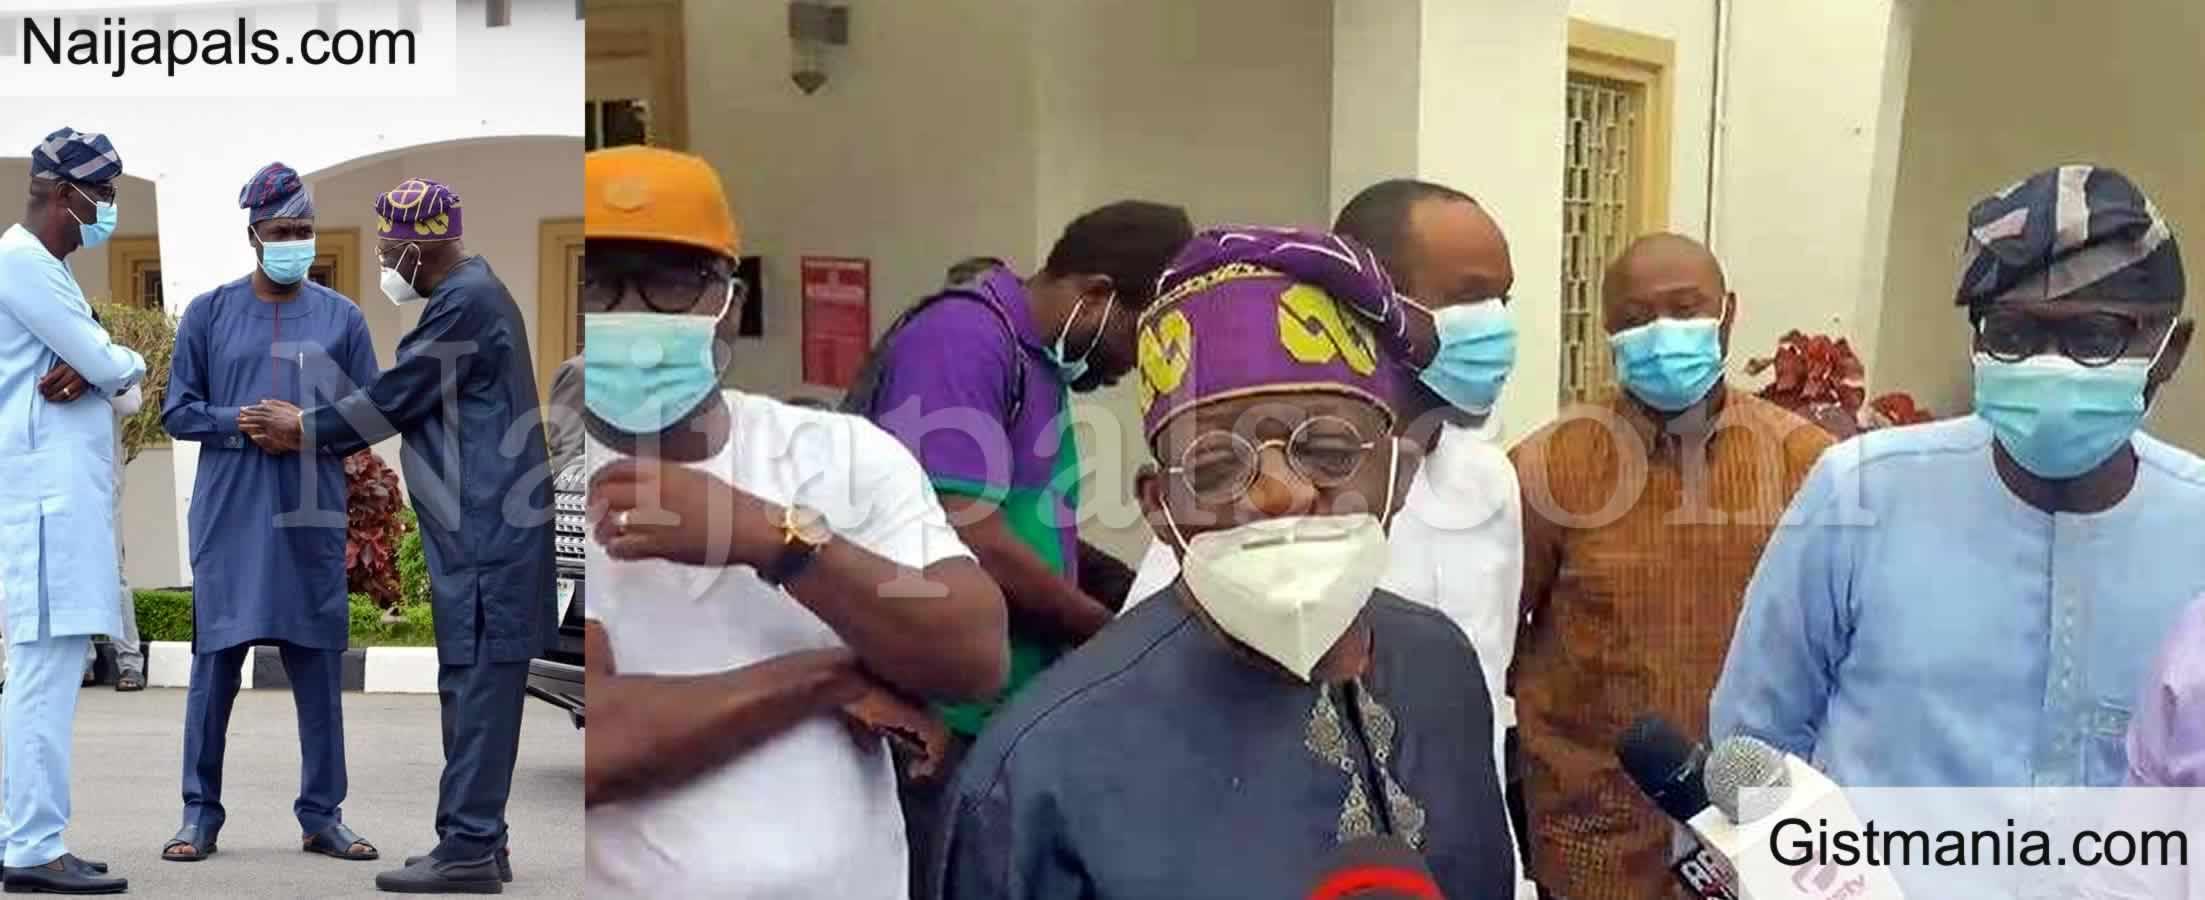 "<img alt='.' class='lazyload' data-src='https://img.gistmania.com/emot/video.gif' /><b> ""I Remain The Jagaban, and Still The Asiwaju Of Lagos"" - Bola Ahmed Tinubu</b>"